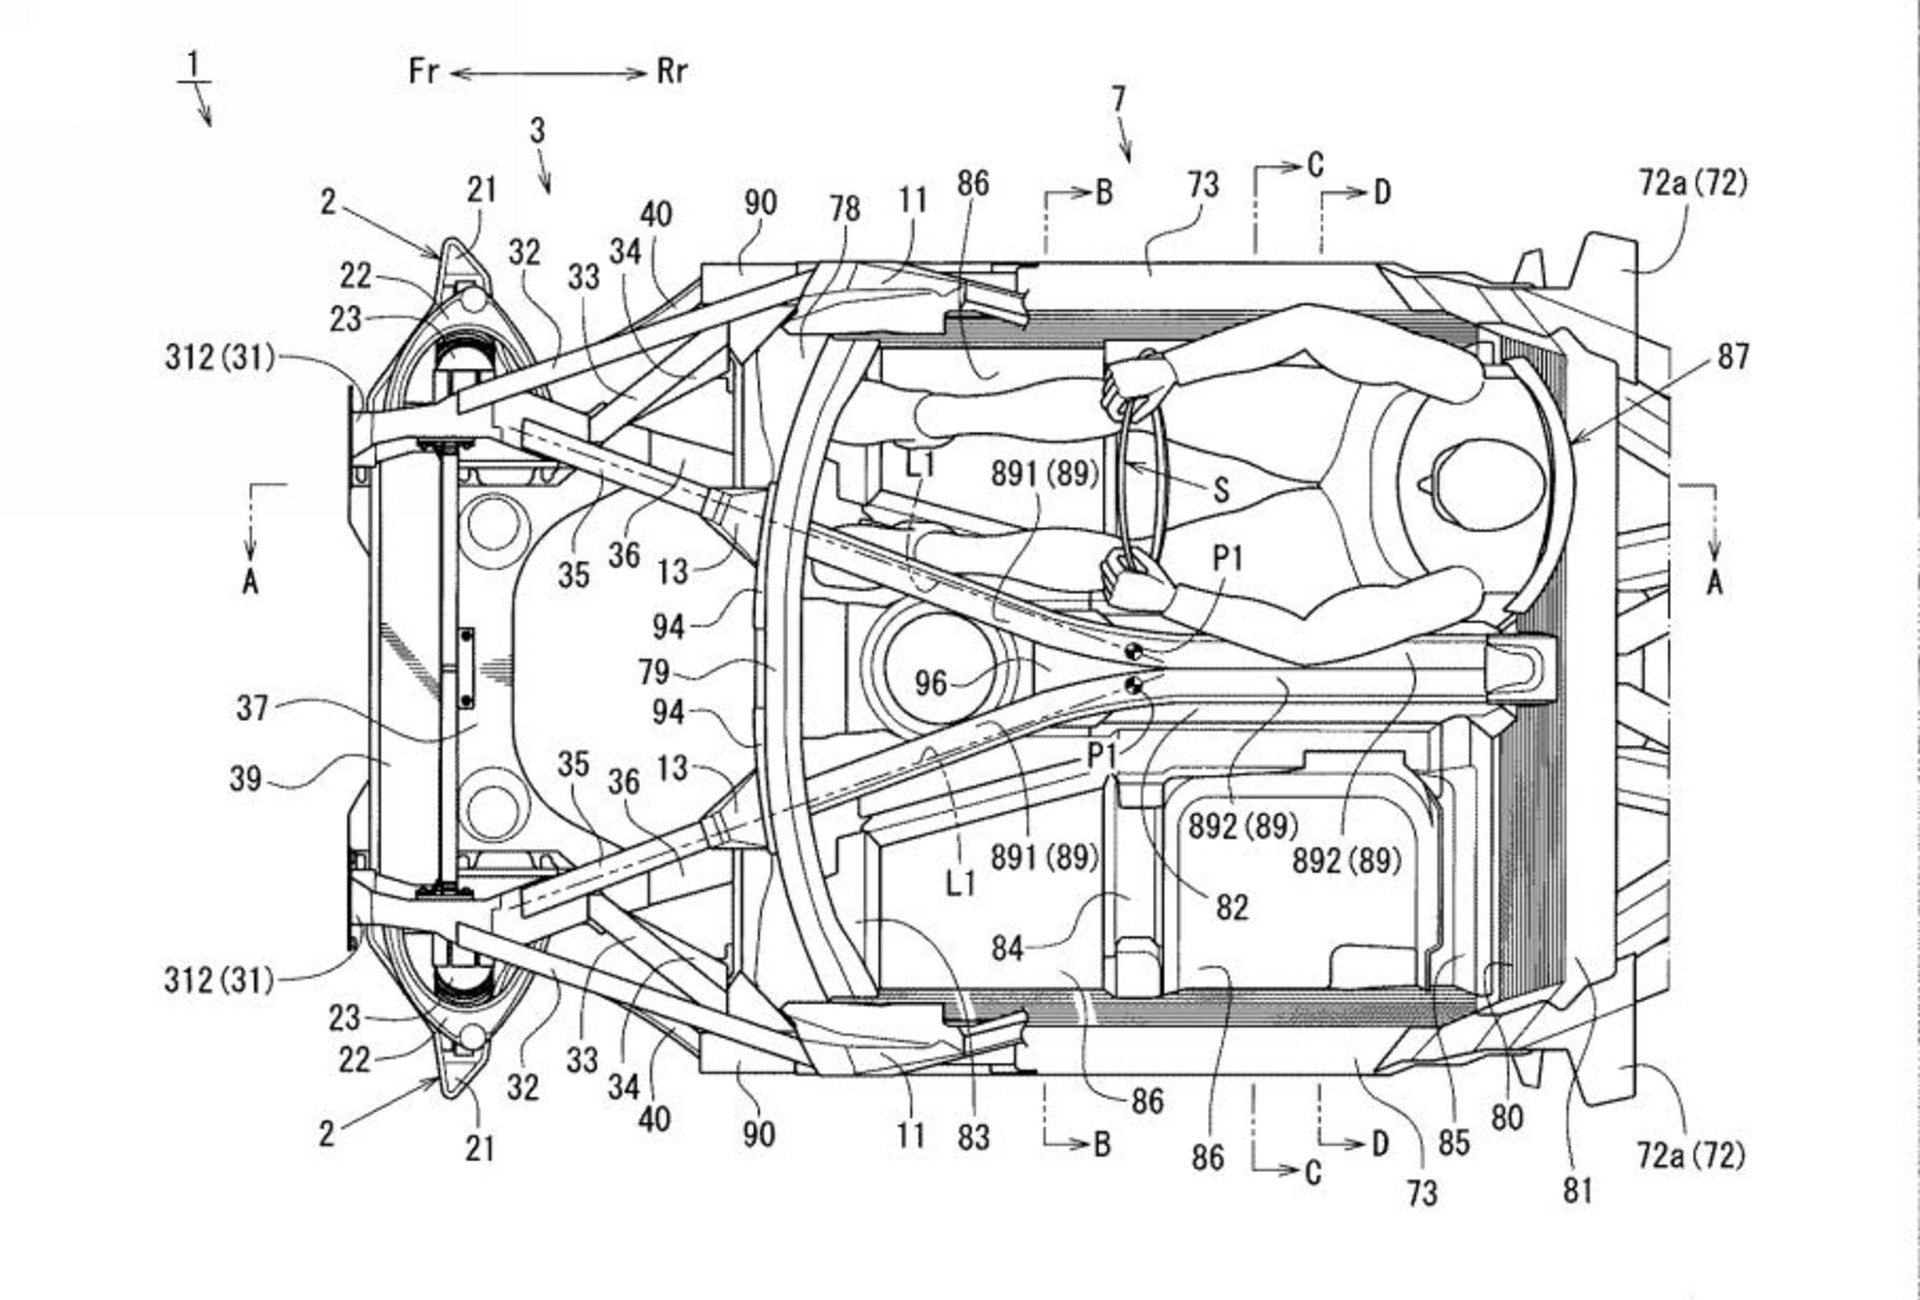 Mazda-Structure-patent-filing-13